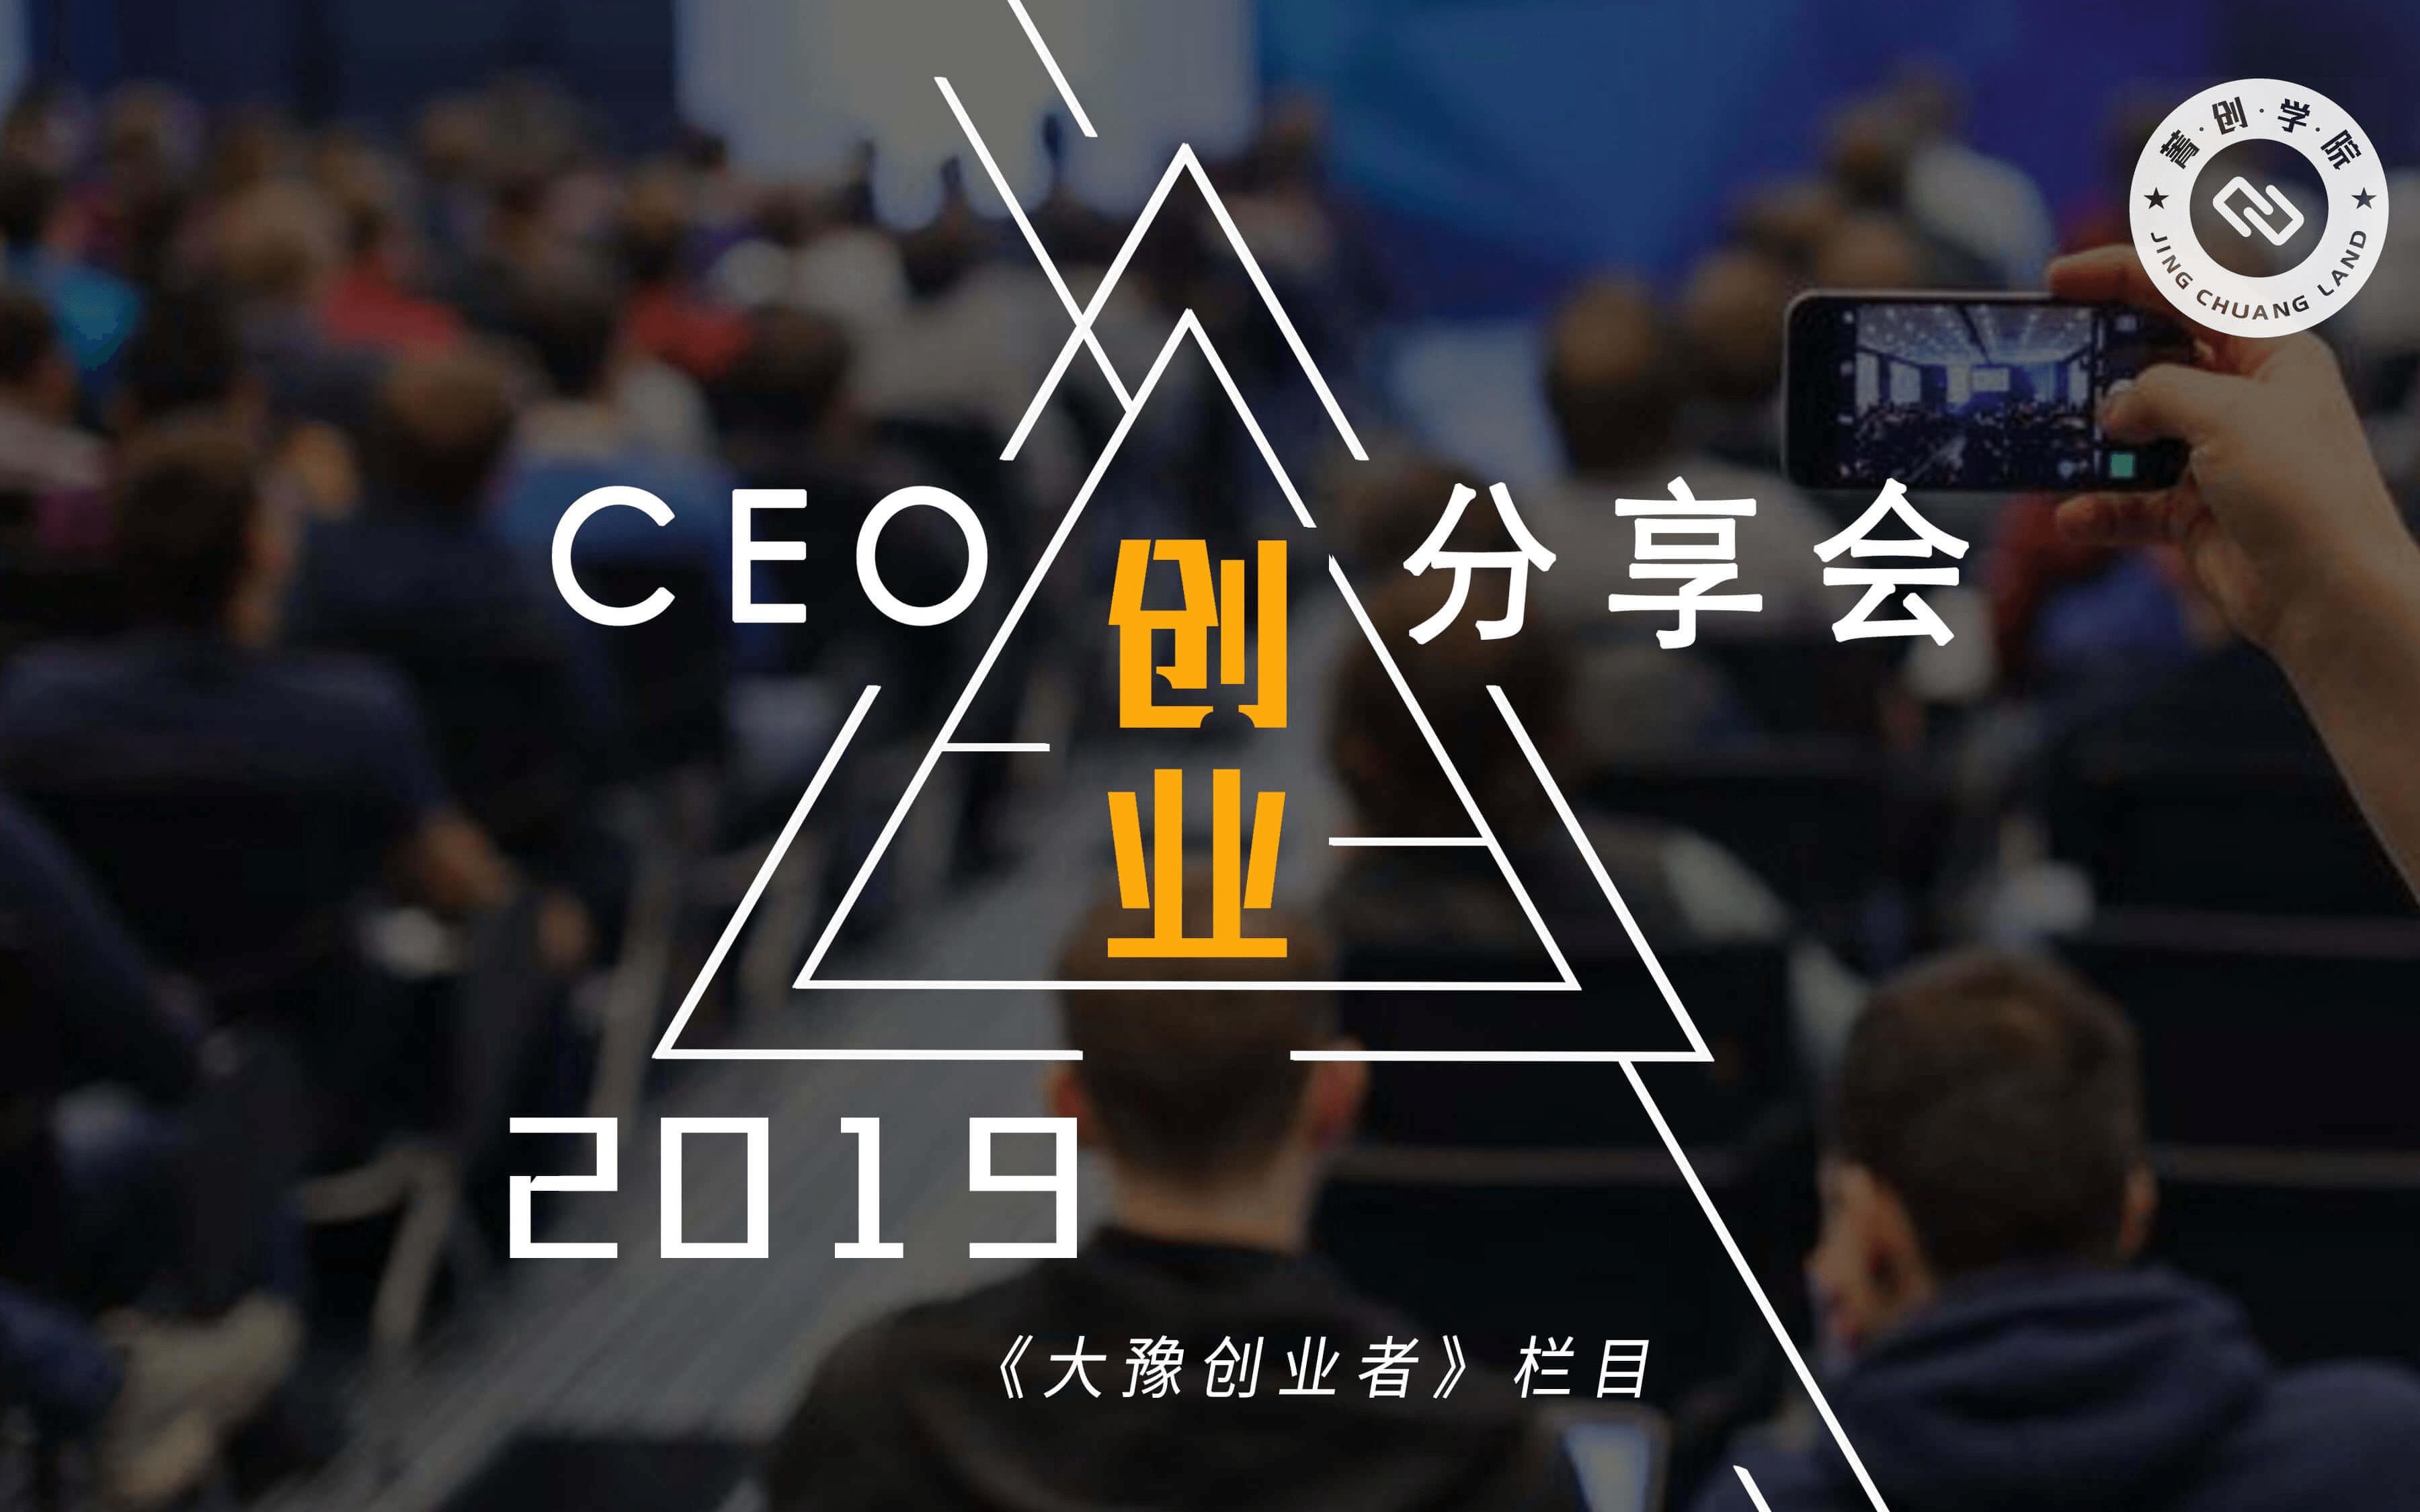 CEOchuang创业分享会(郑州)